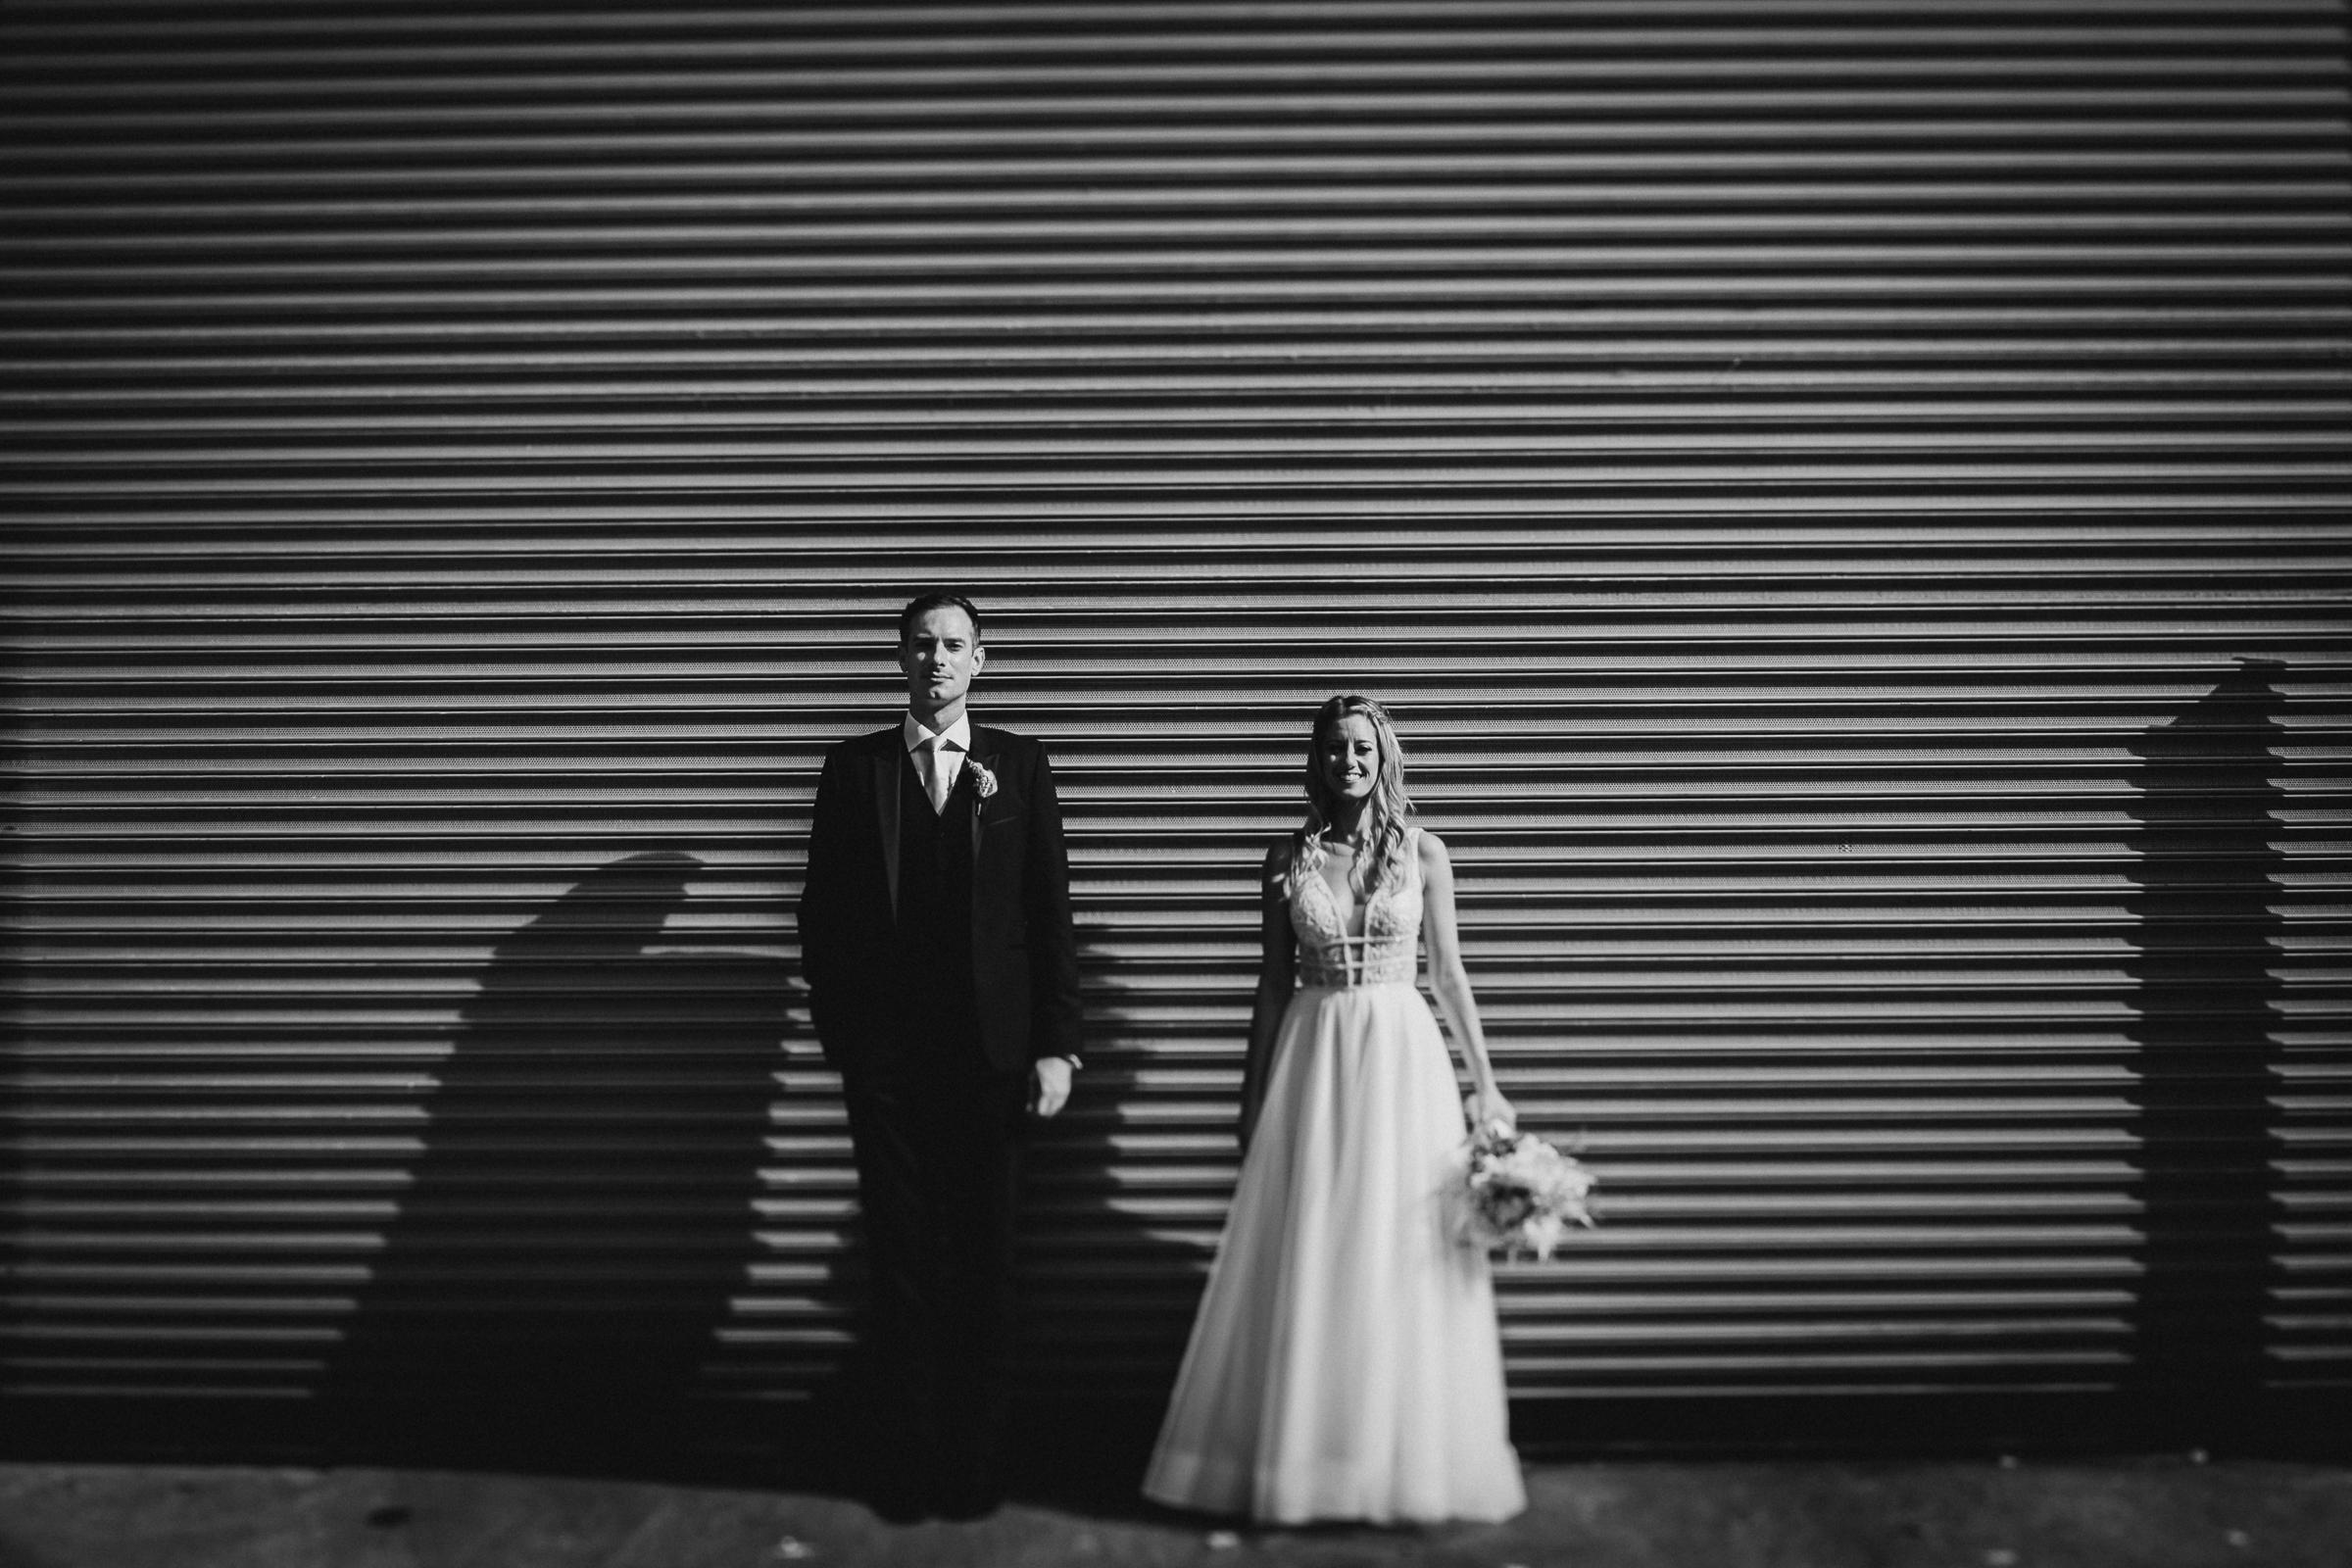 Ravel-Hotel-Penthouse-808-Long-Island-City-New-York-Documentary-Wedding-Photographer-39.jpg